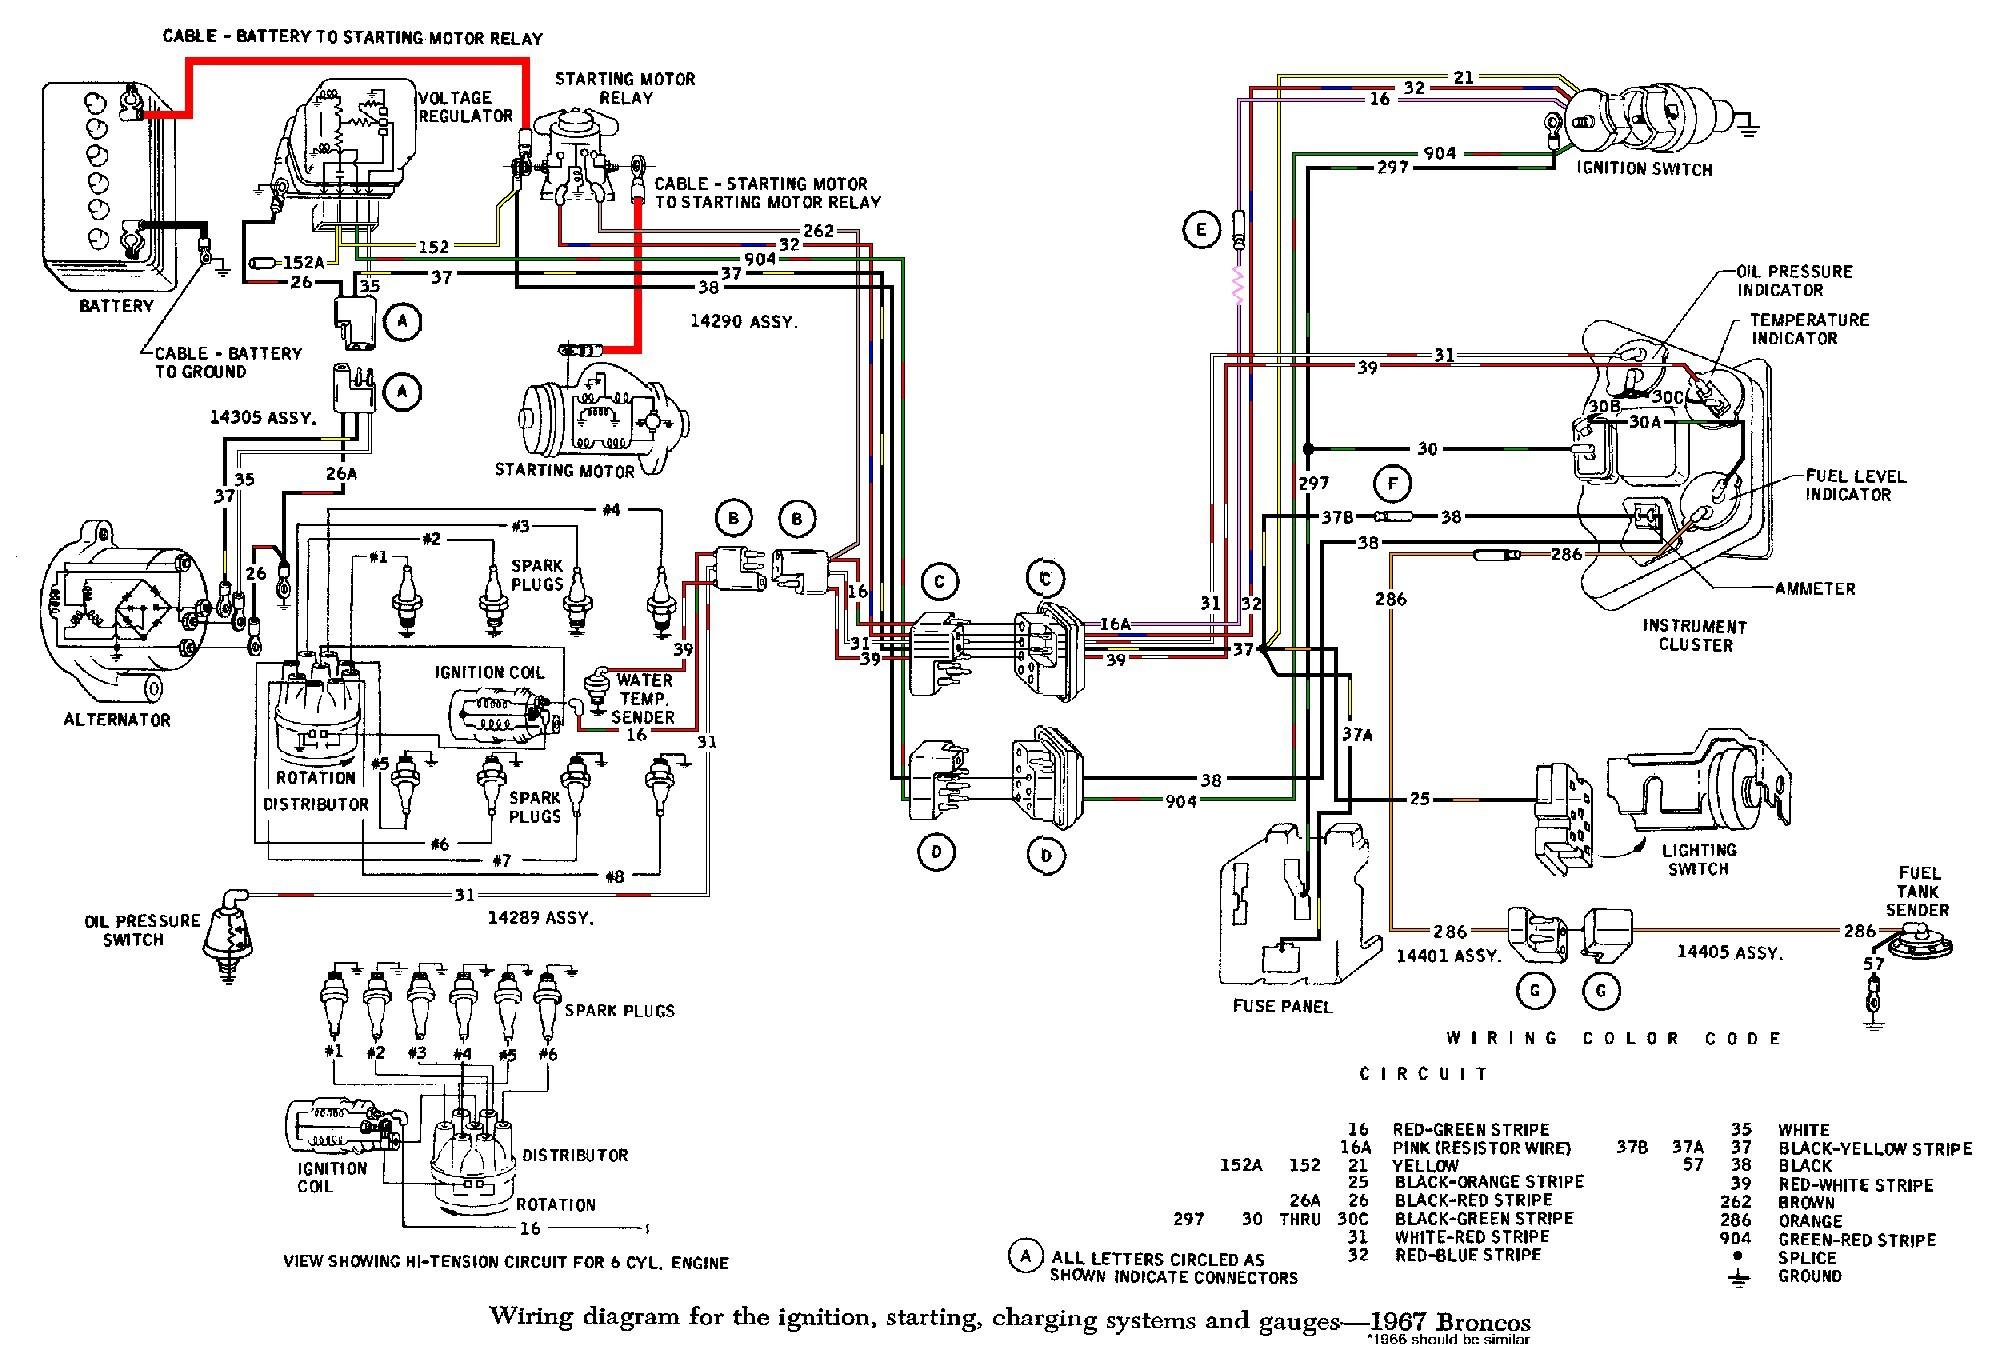 Wiring Diagram for A Jvc Car Stereo Jvc Radio Wiring Diagram Unique Unusual Jvc Car Stereo Yellow Wire Of Wiring Diagram for A Jvc Car Stereo